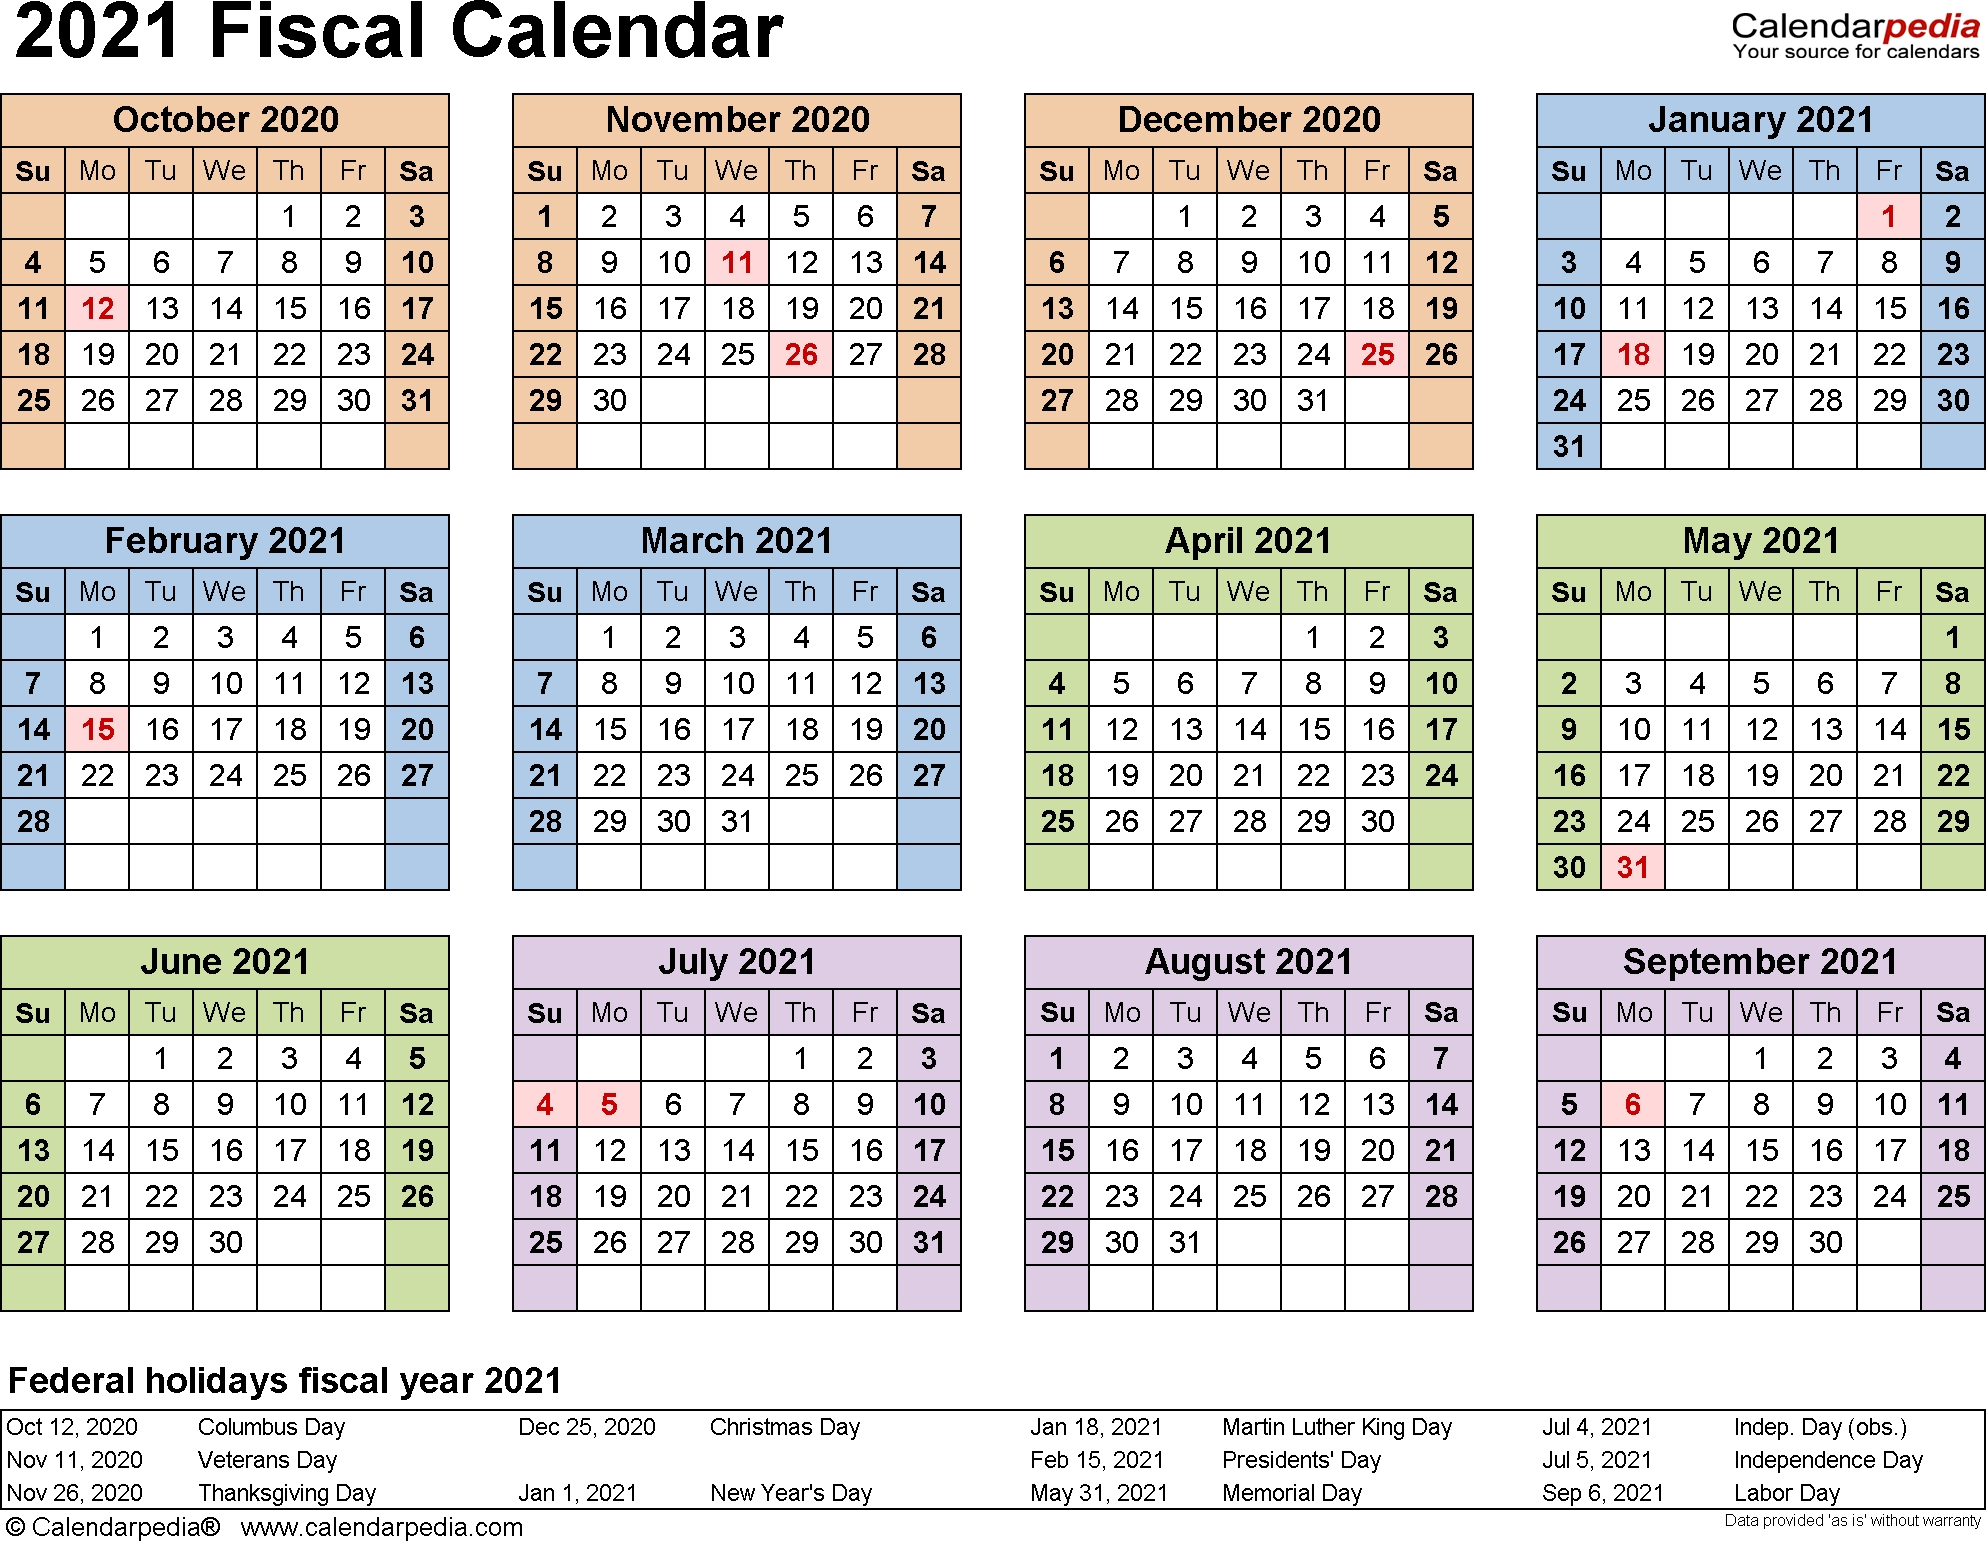 Fiscal Calendars 2021 - Free Printable Pdf Templates regarding 4 5 5 Fiscal 2020 Calendar